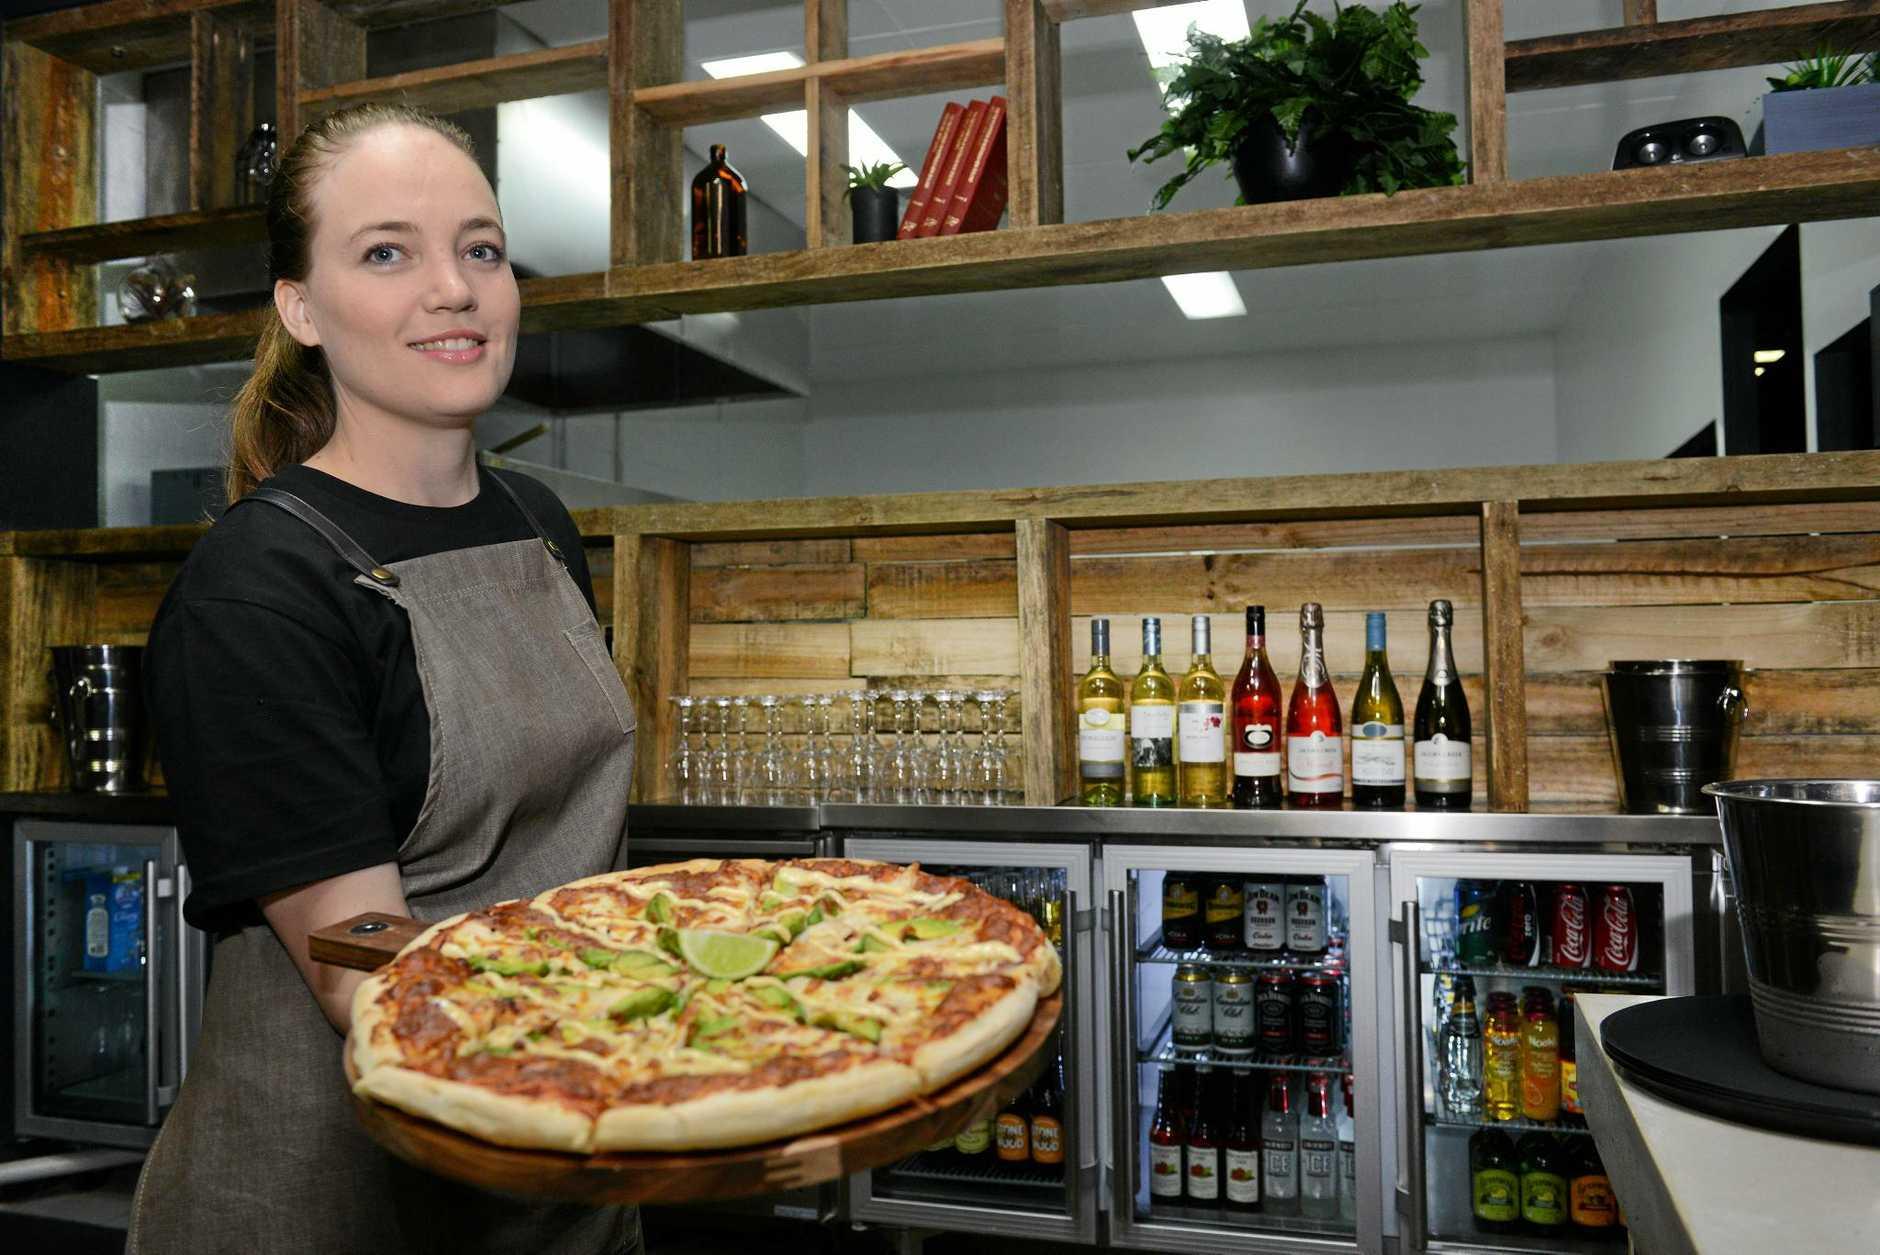 NEW BUSINESS: Melanie Szalkowski serves fresh creations at Jandas pizzeria on Bourbong, St Bundaberg. Photo: Paul Donaldson / NewsMail